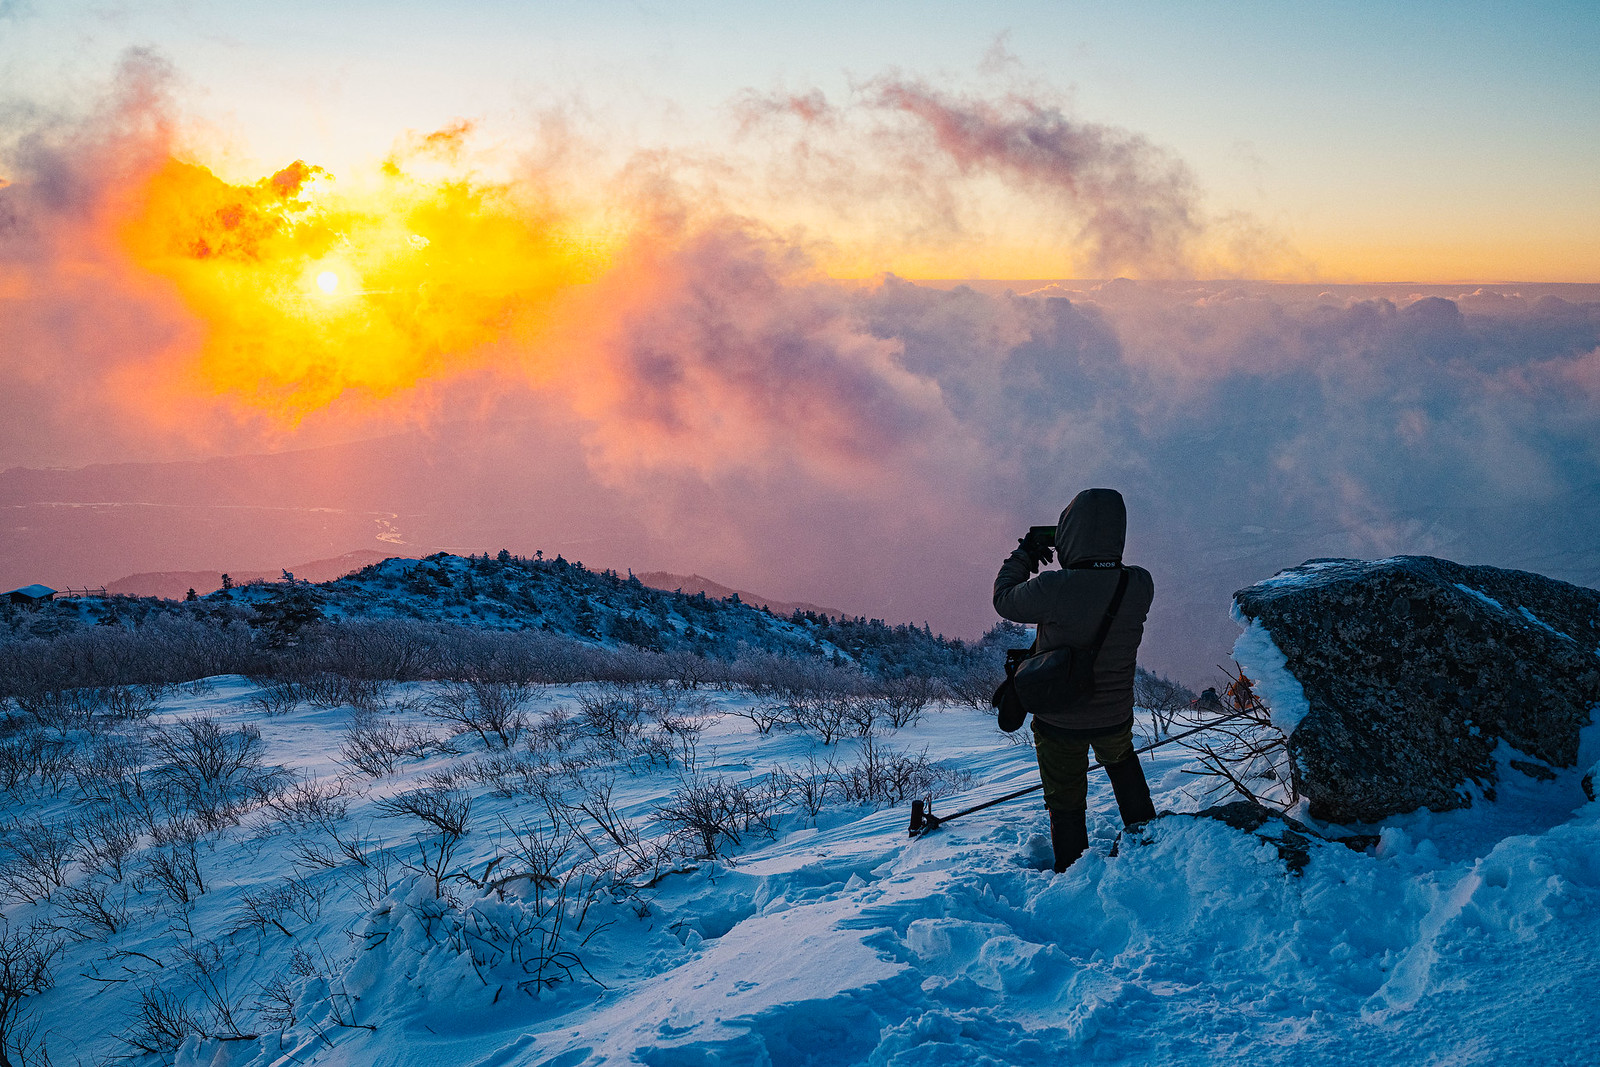 Mountaineer Photographic the Sunrise on Seoraksan